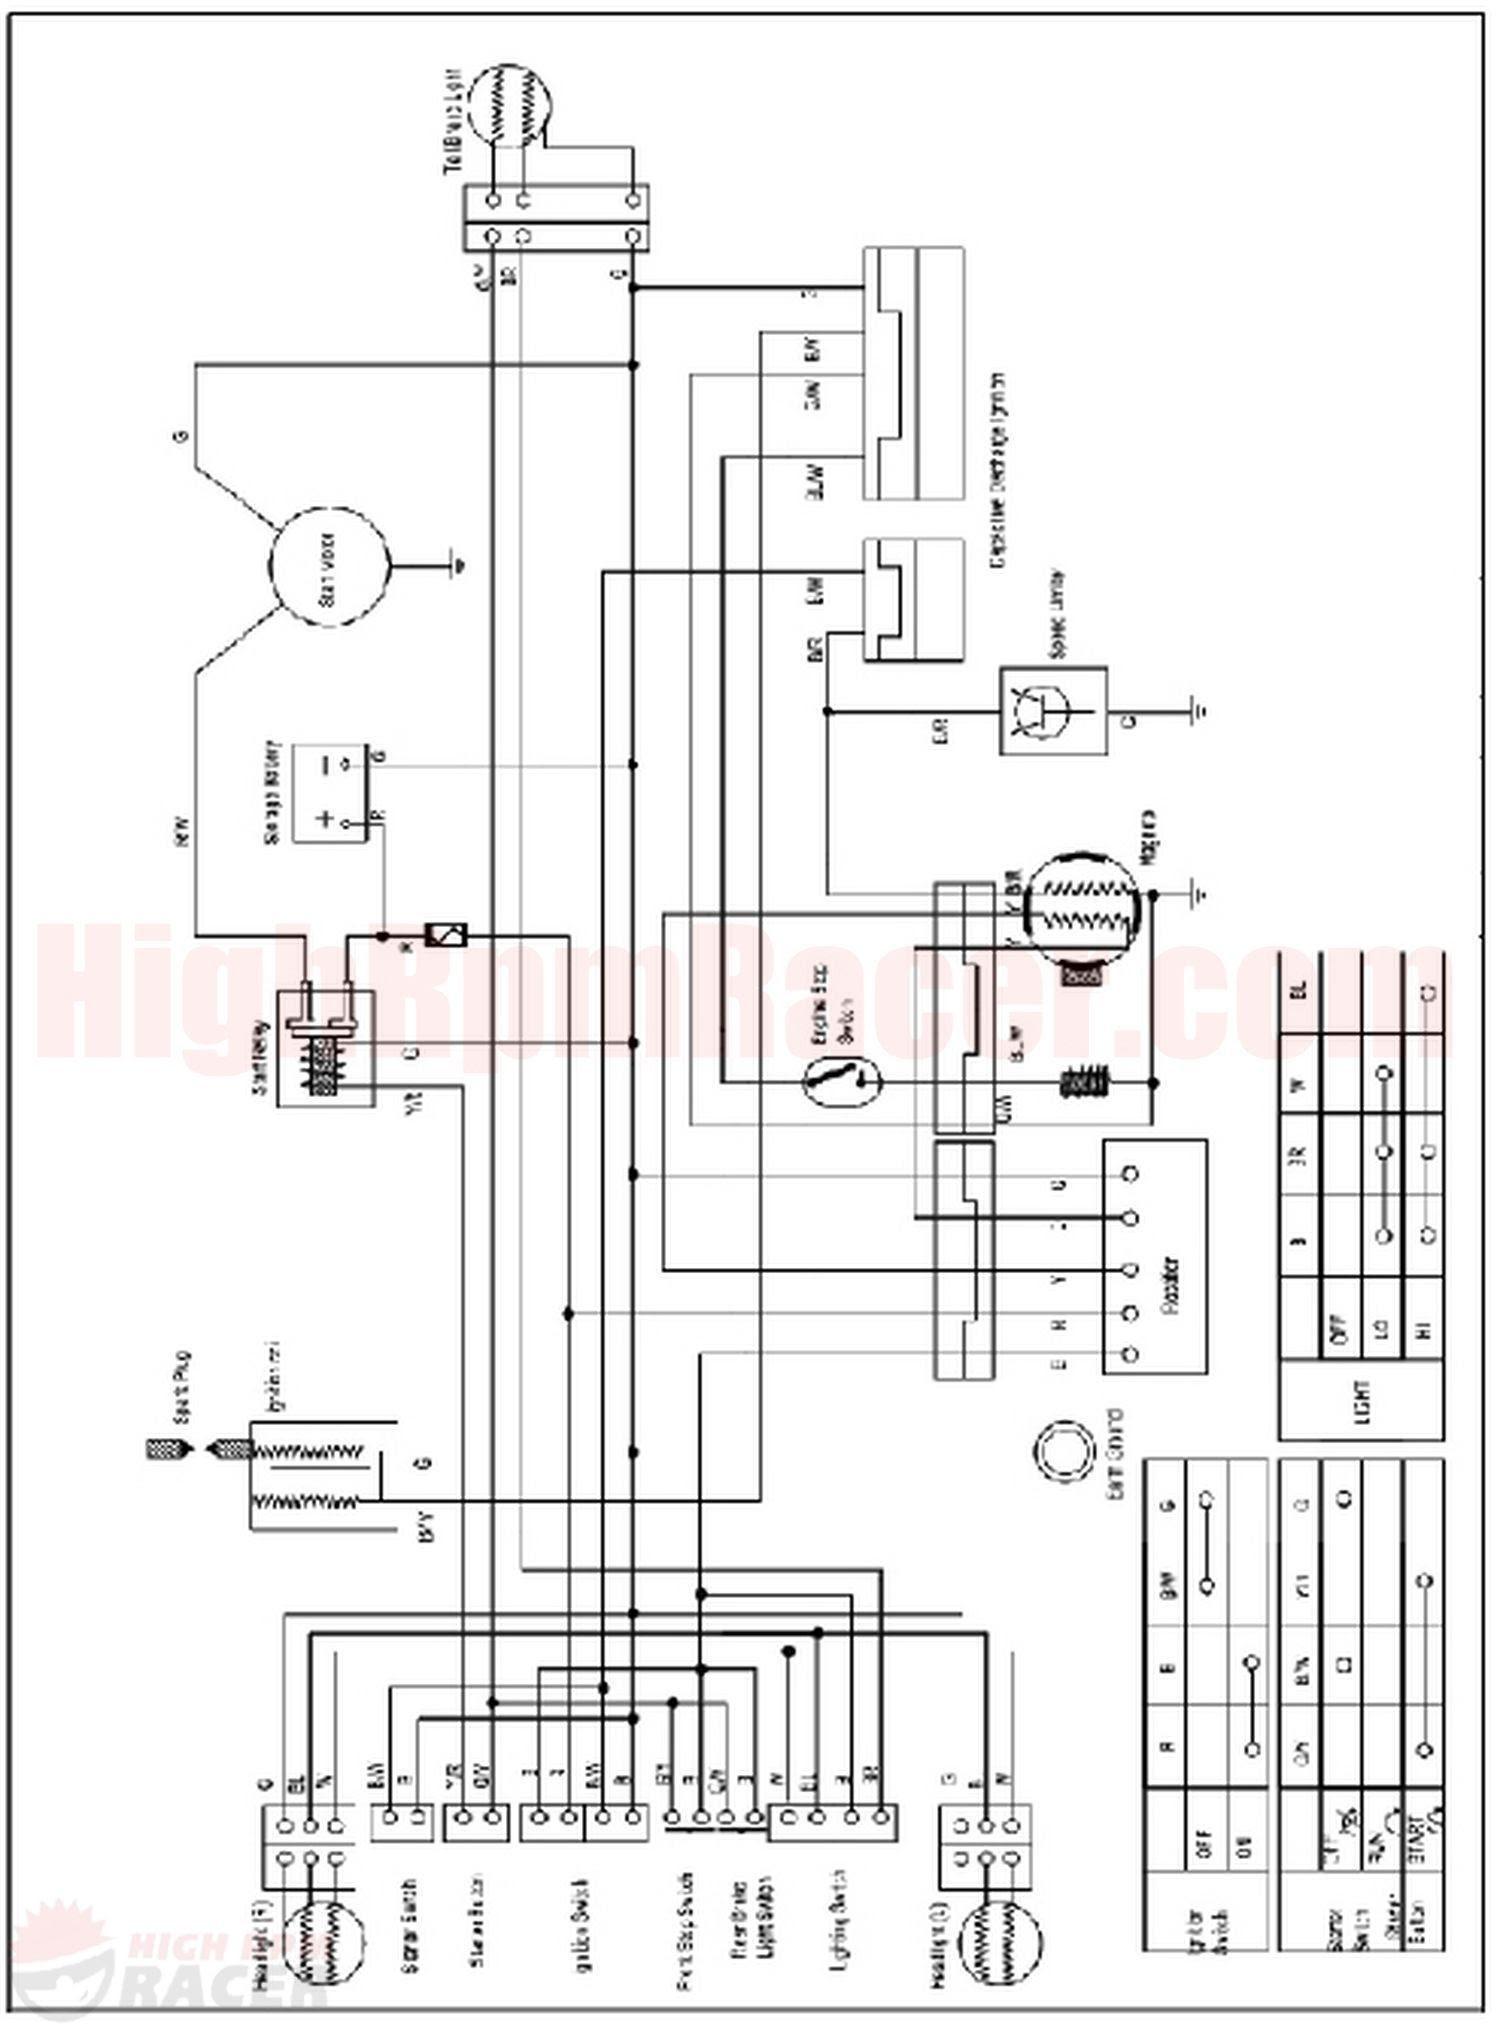 Diagram 250 Cc Chinese Atv Wiring Diagrams Full Version Hd Quality Wiring Diagrams Diagrambyerw Trattorialamarina It